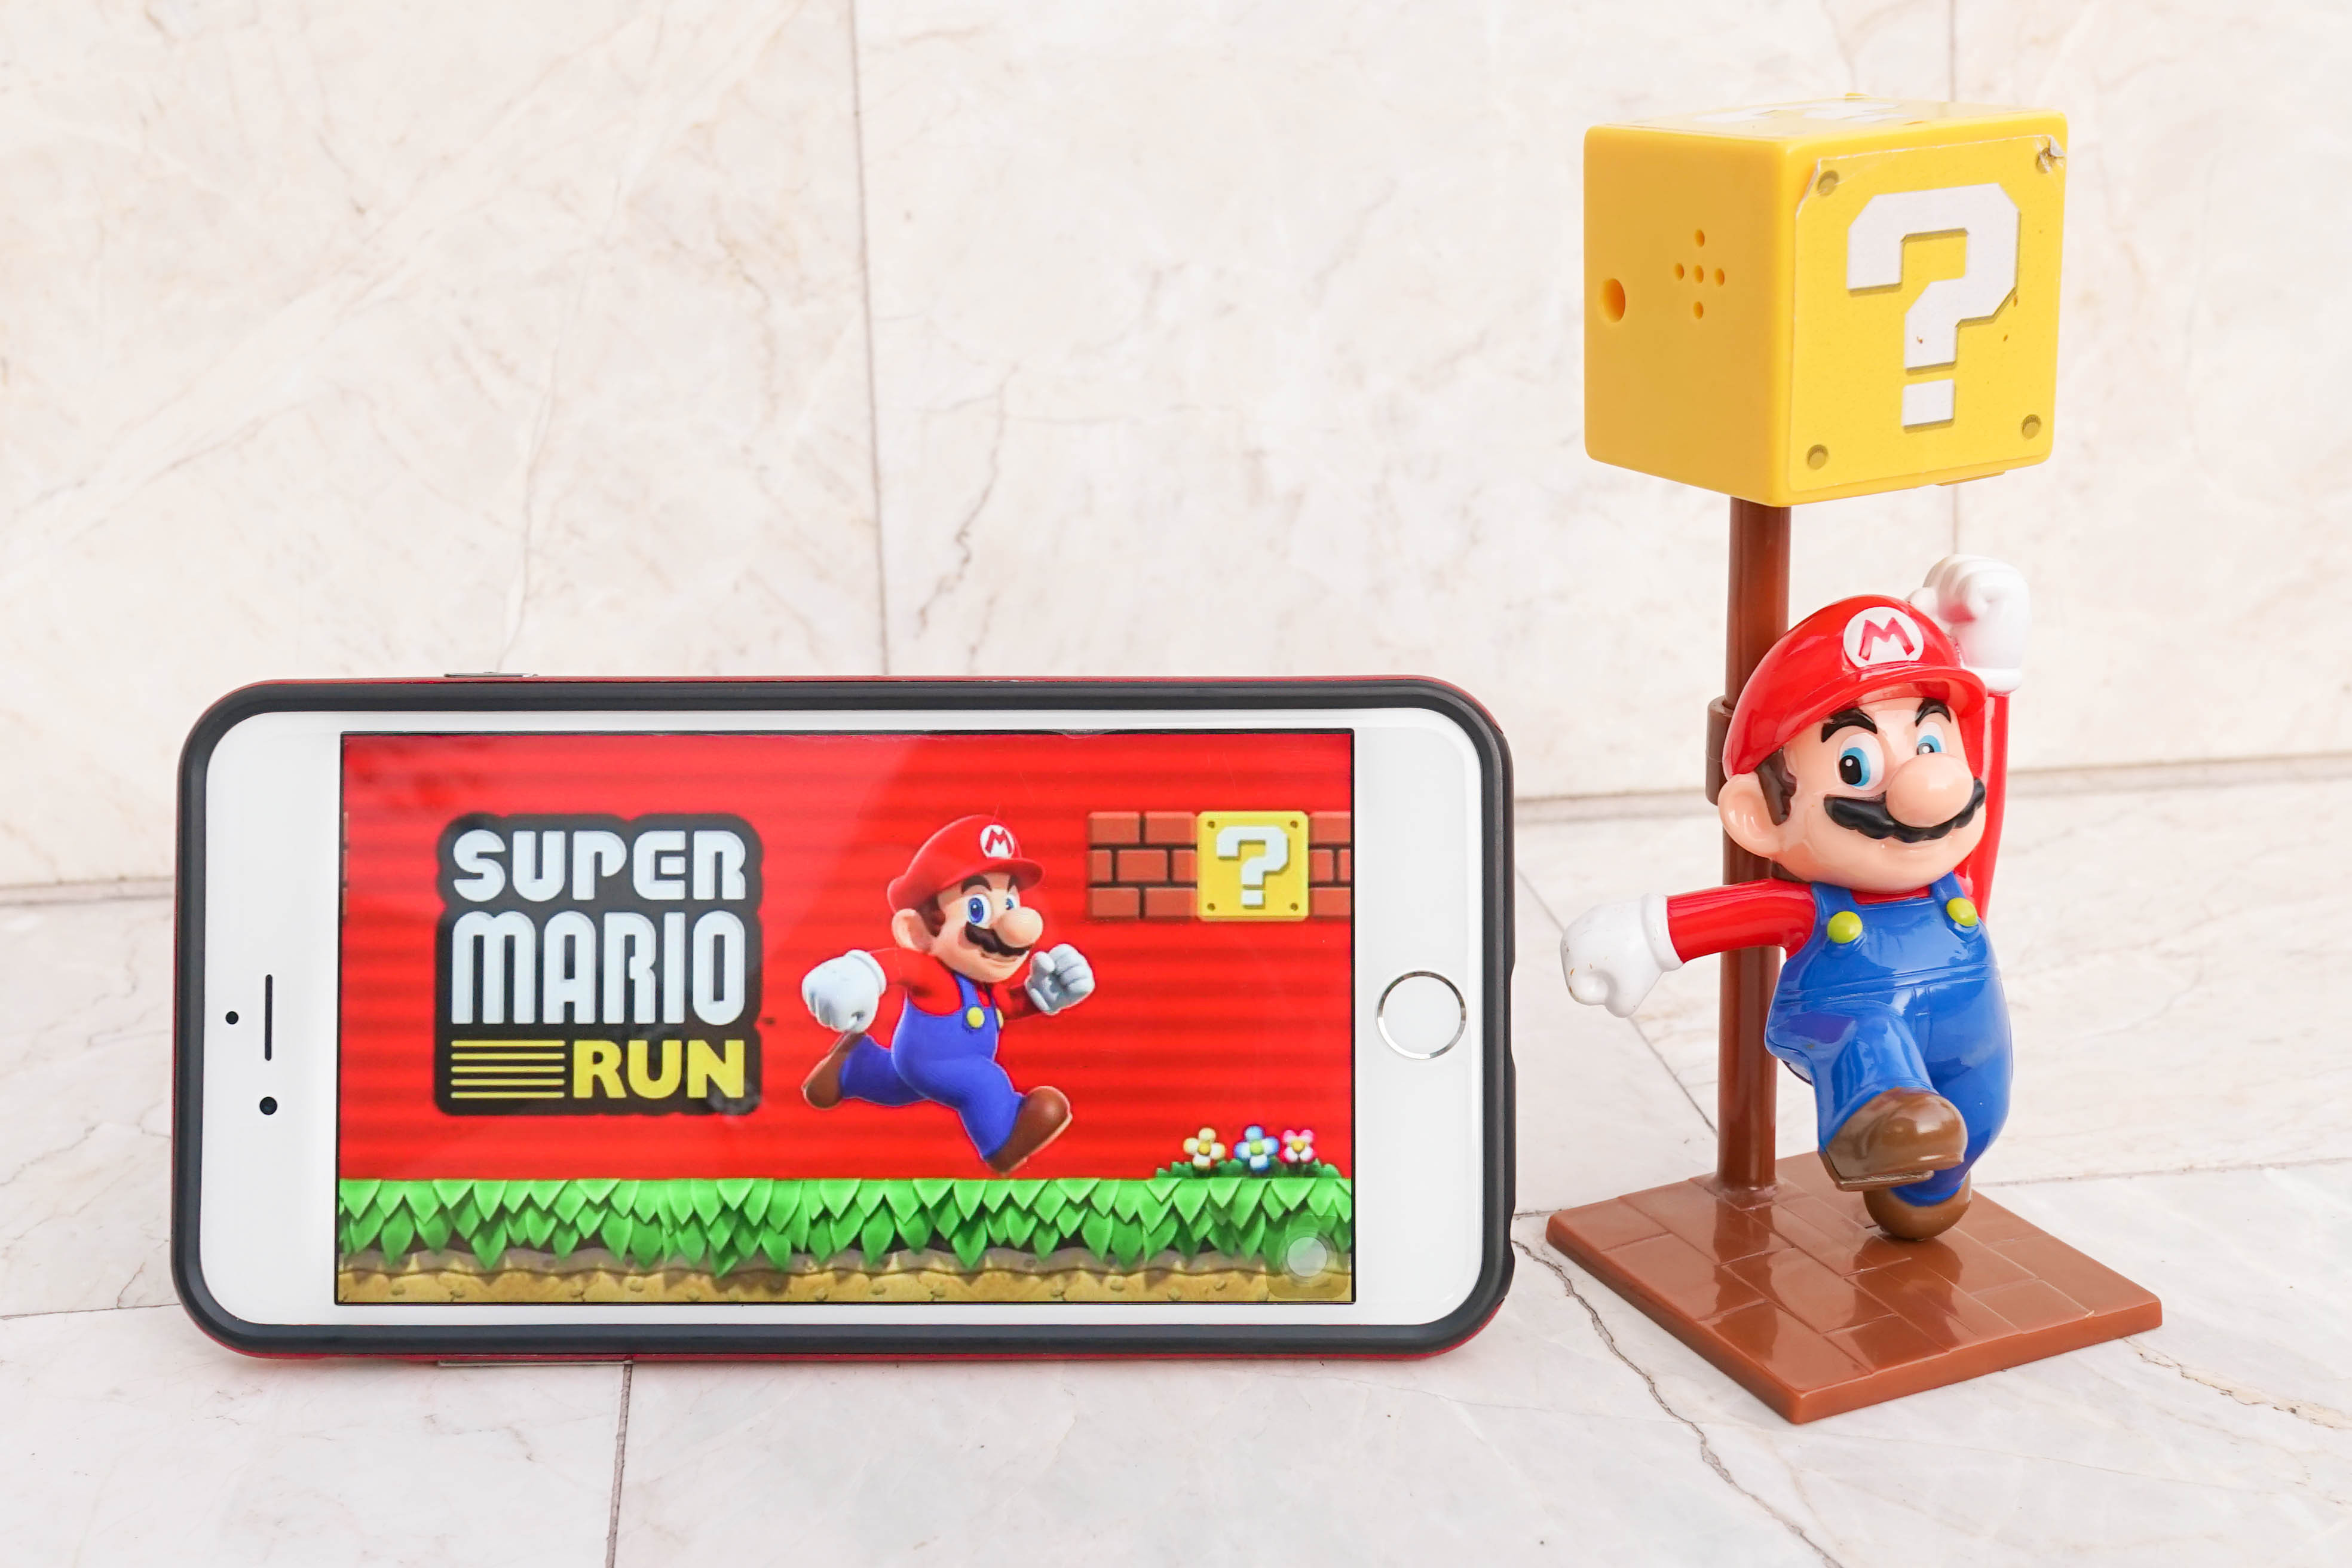 Super Mario Run's poor reviews have knocked billions off